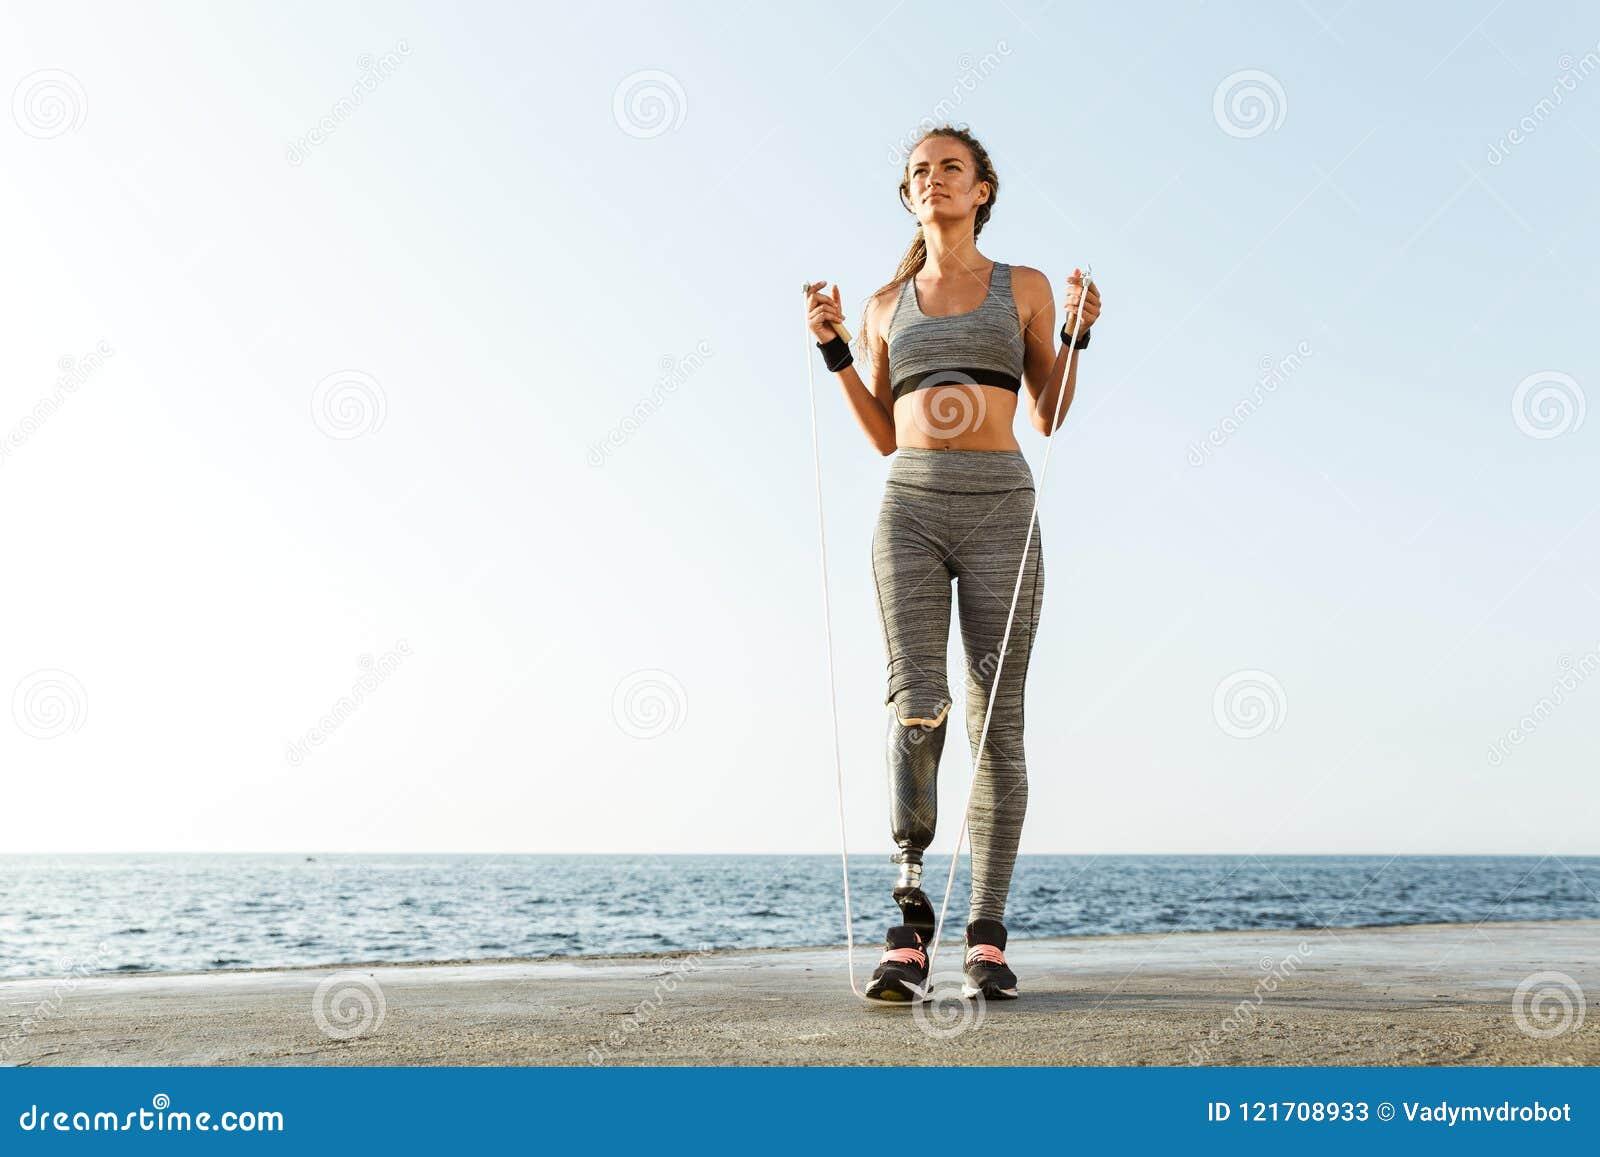 Comprimento completo da mulher deficiente segura do atleta